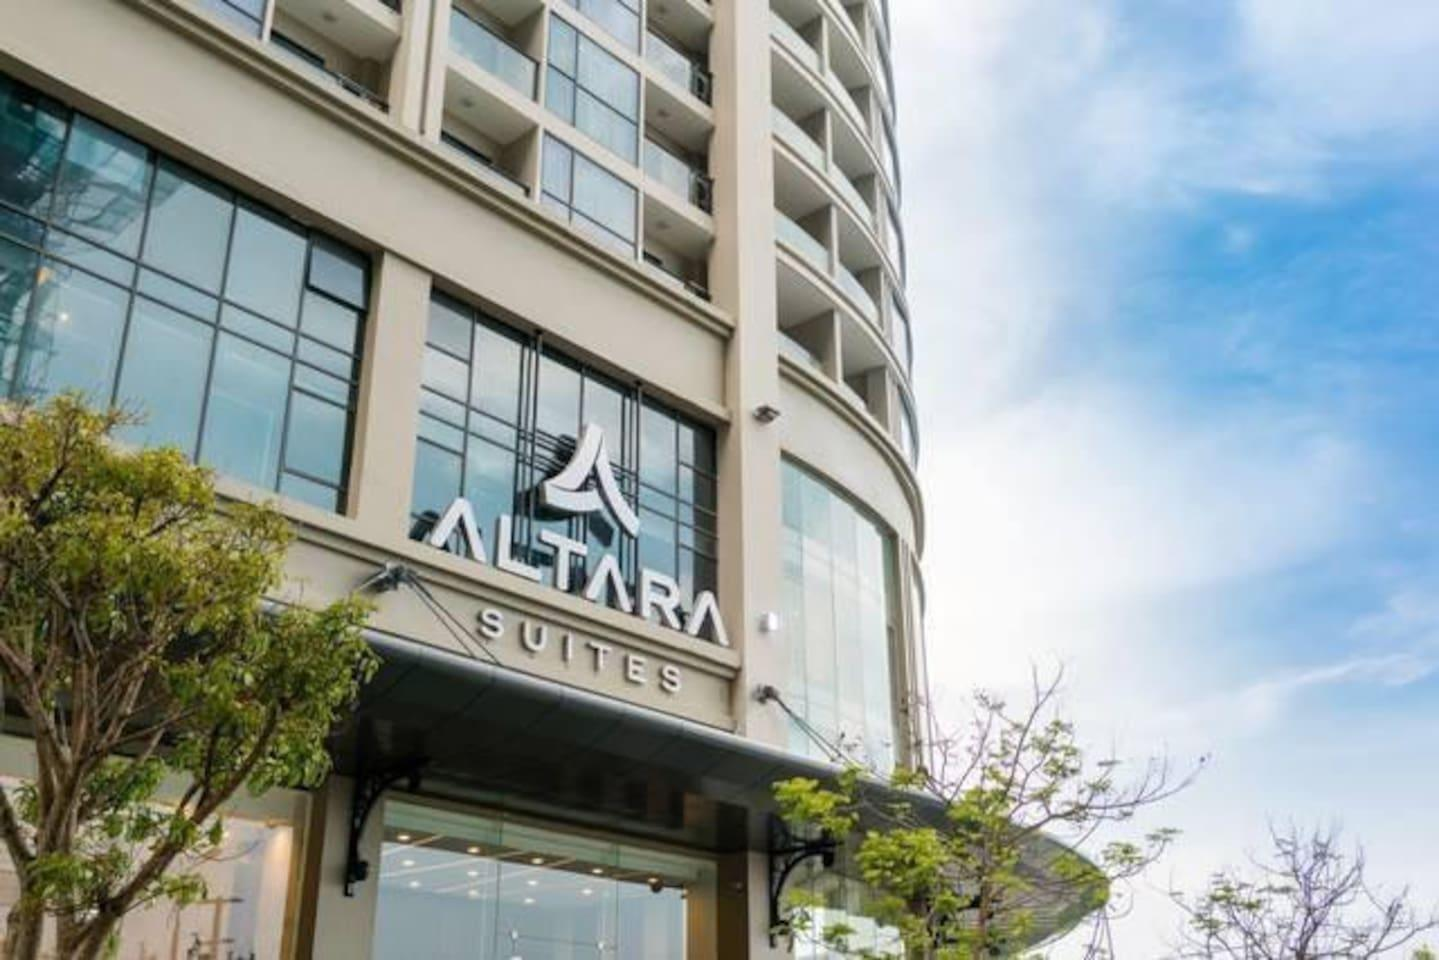 Apartment Altara Suites by Sheraton  30th floor  photo 18315368